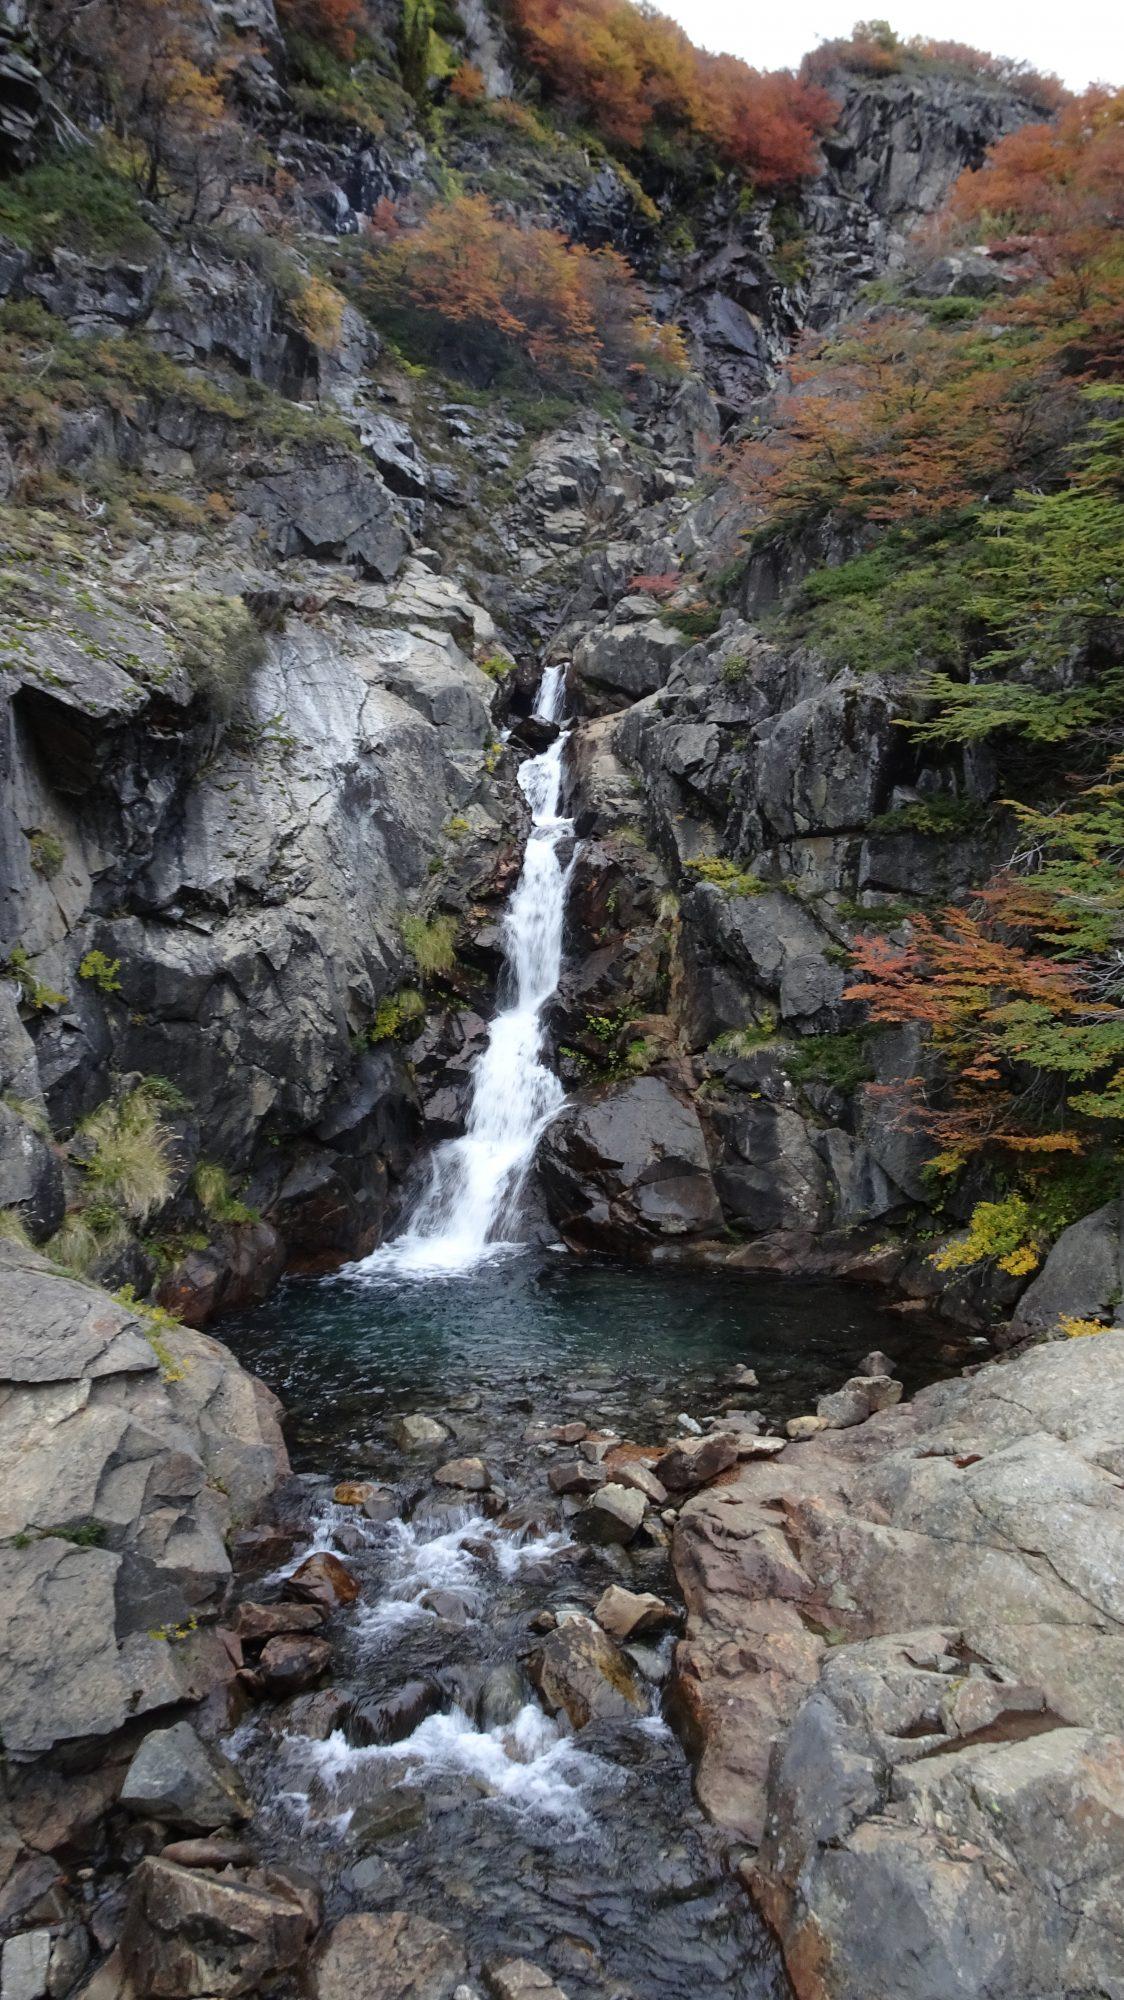 Fjella Bariloche Nahuel-Huapi Traverse Wanderung Wanderroute Refugio Jacob Colonia Suiza Refugio Laguna Negra Patagonien Argentinische Schweiz Wasserfall